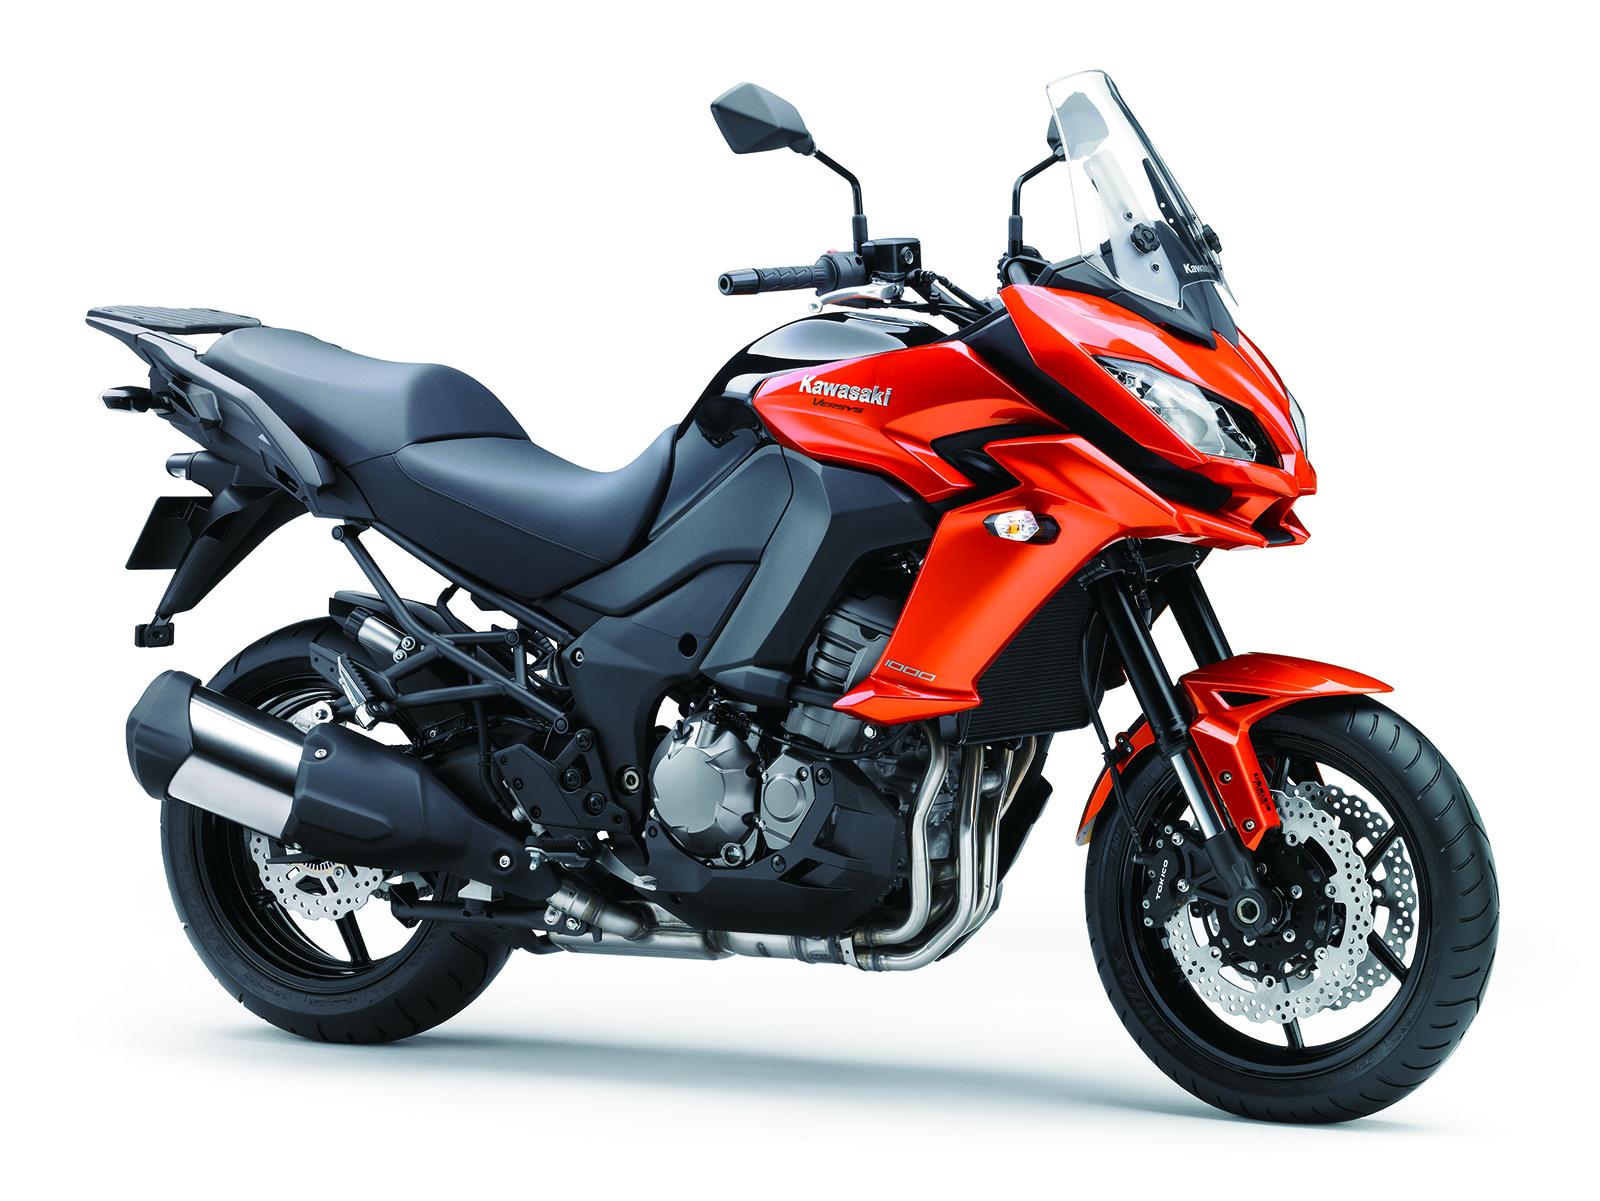 Intermot 2014: new Kawasaki Versys 1000 unveiled